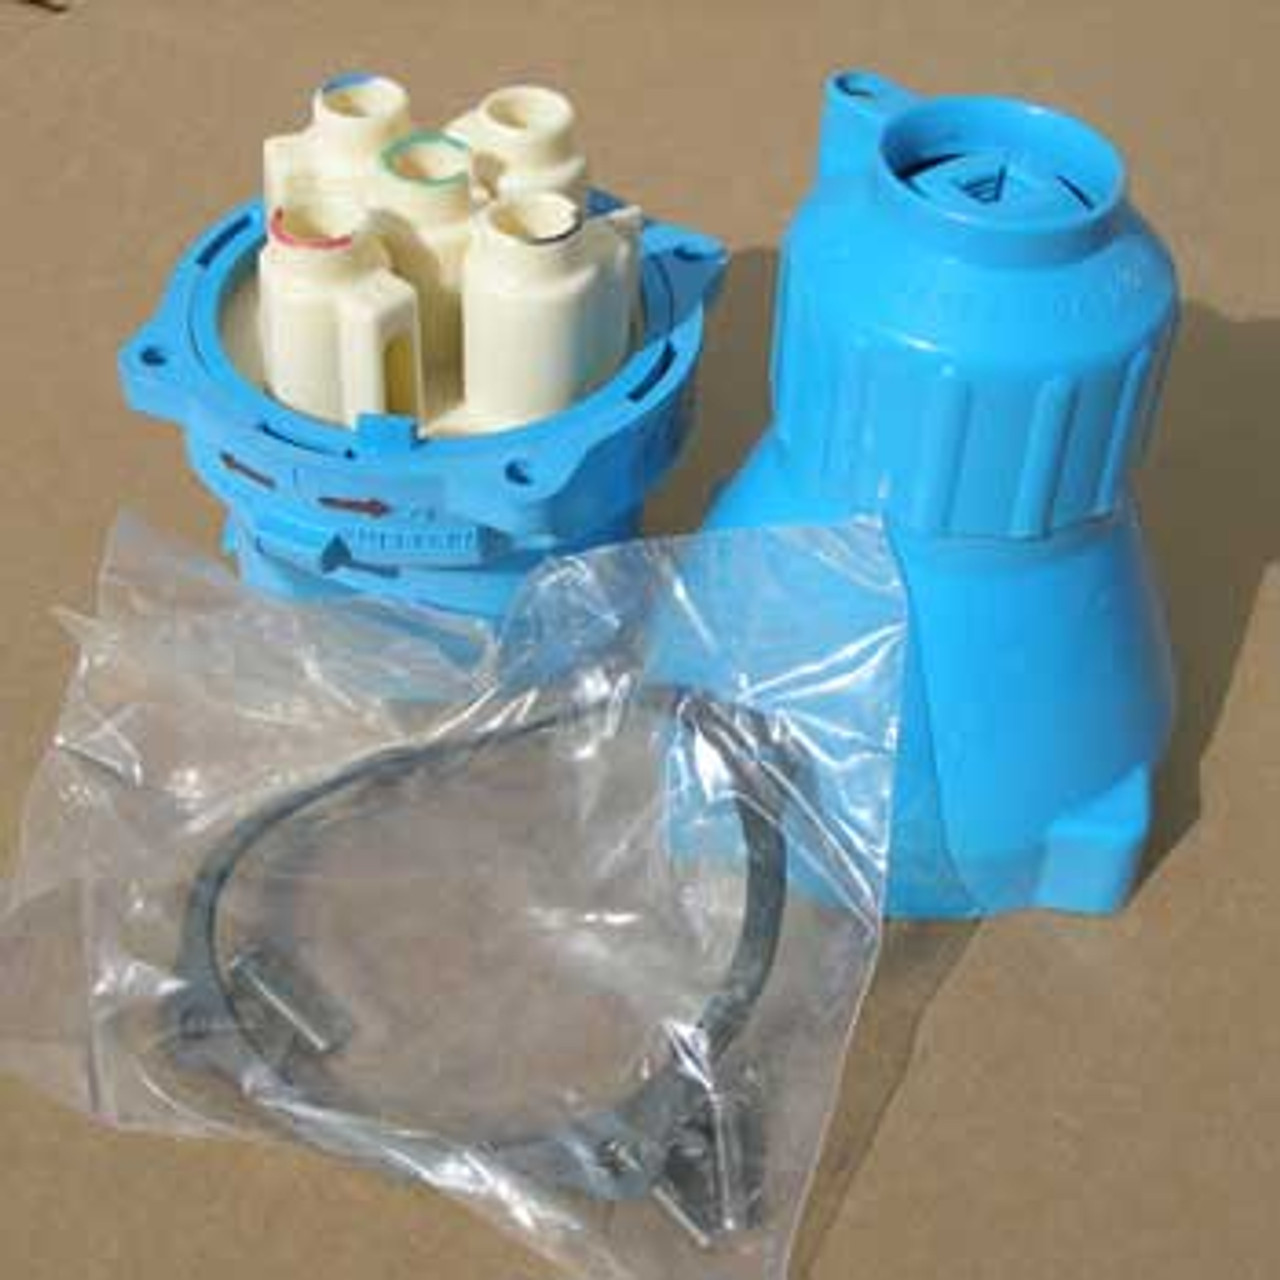 Meltric 31-61243 90 Amp 480 Volt Plug, Type DR